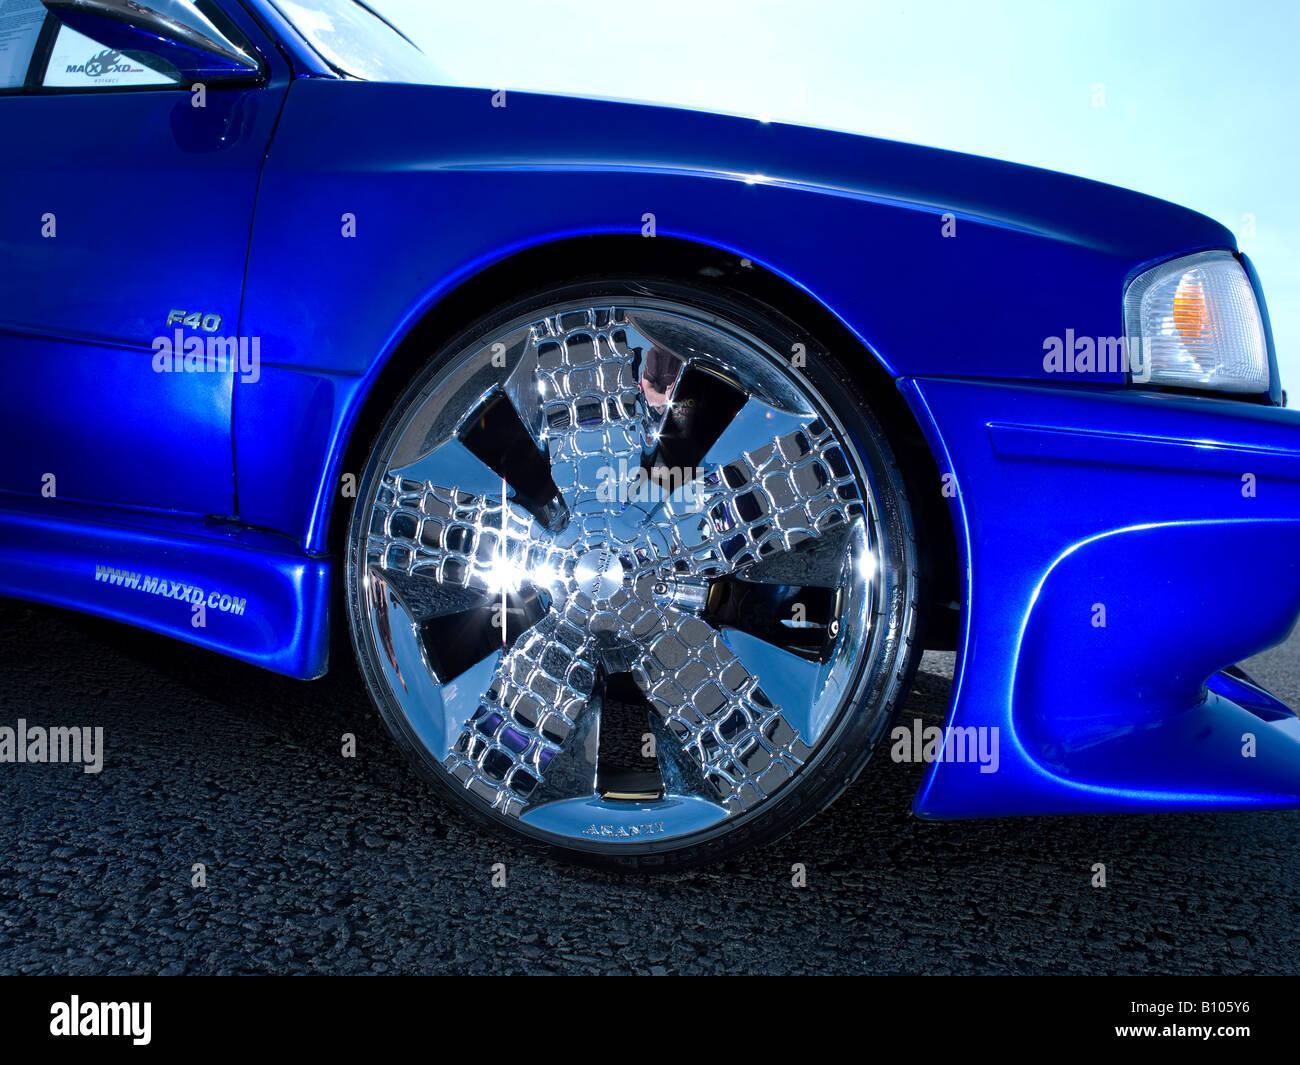 Chrome Wheel Rim Of Slammed Blue Ford Escort Modified Max Power Car